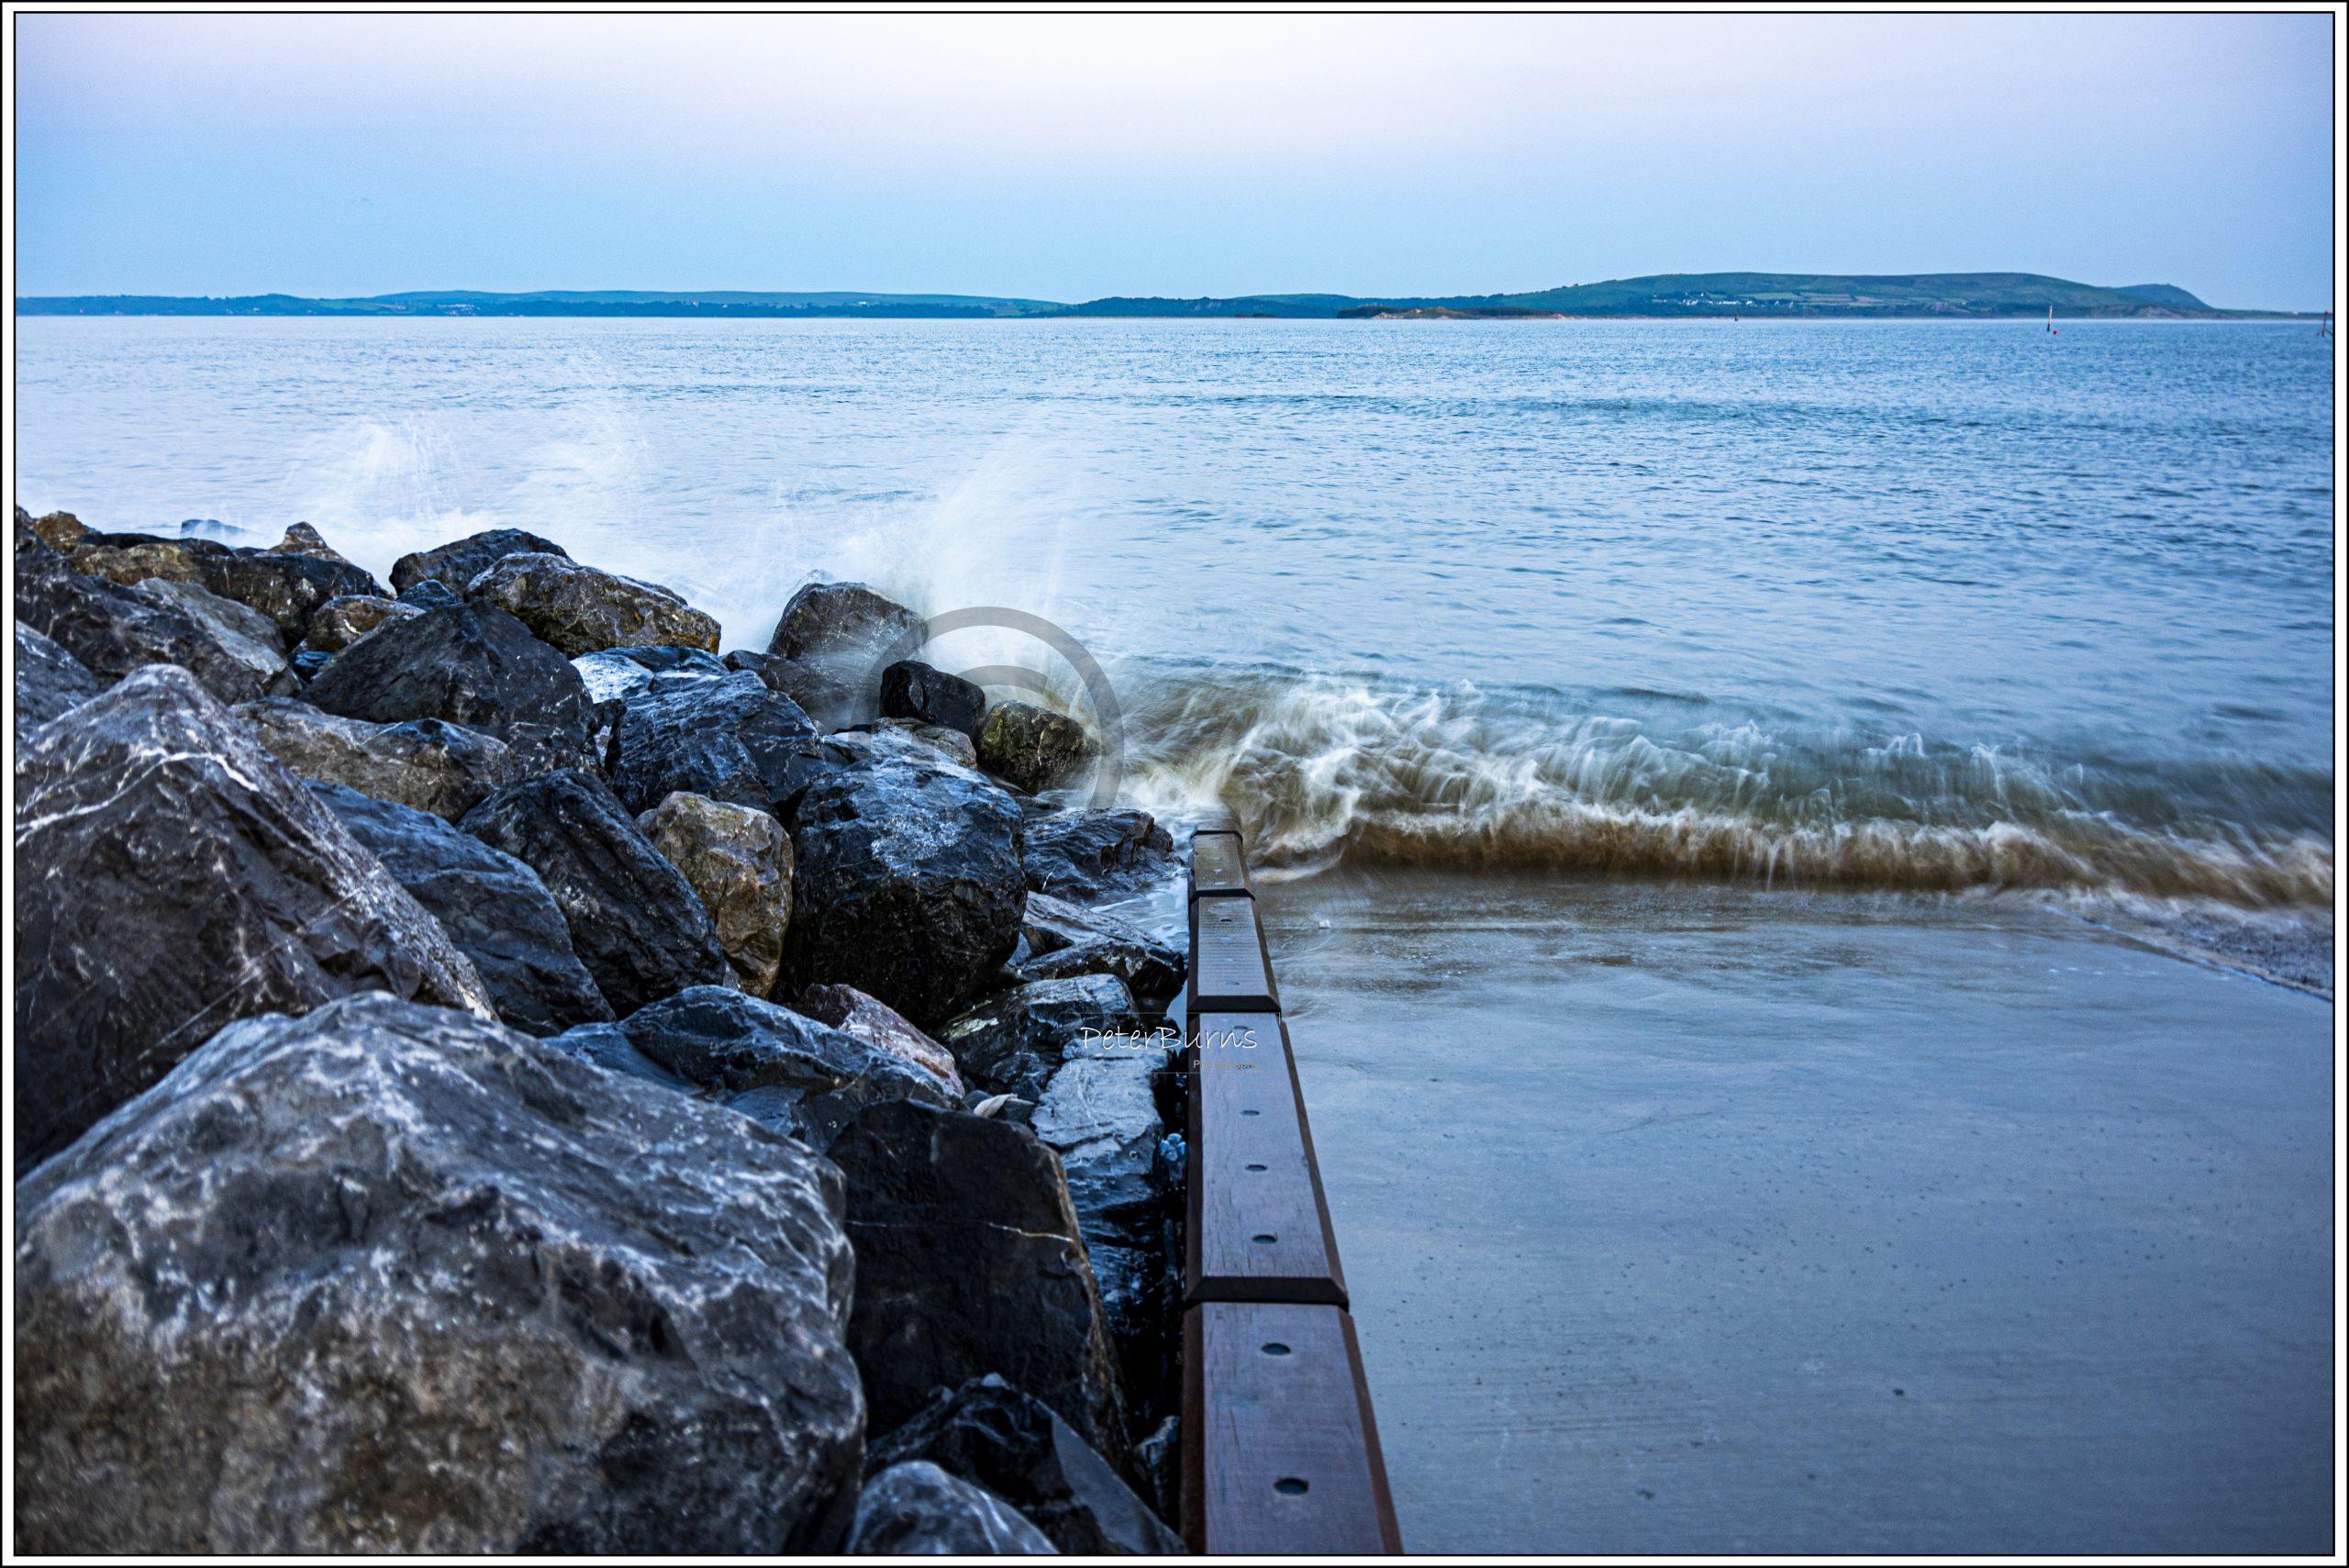 burry-port-beach-005